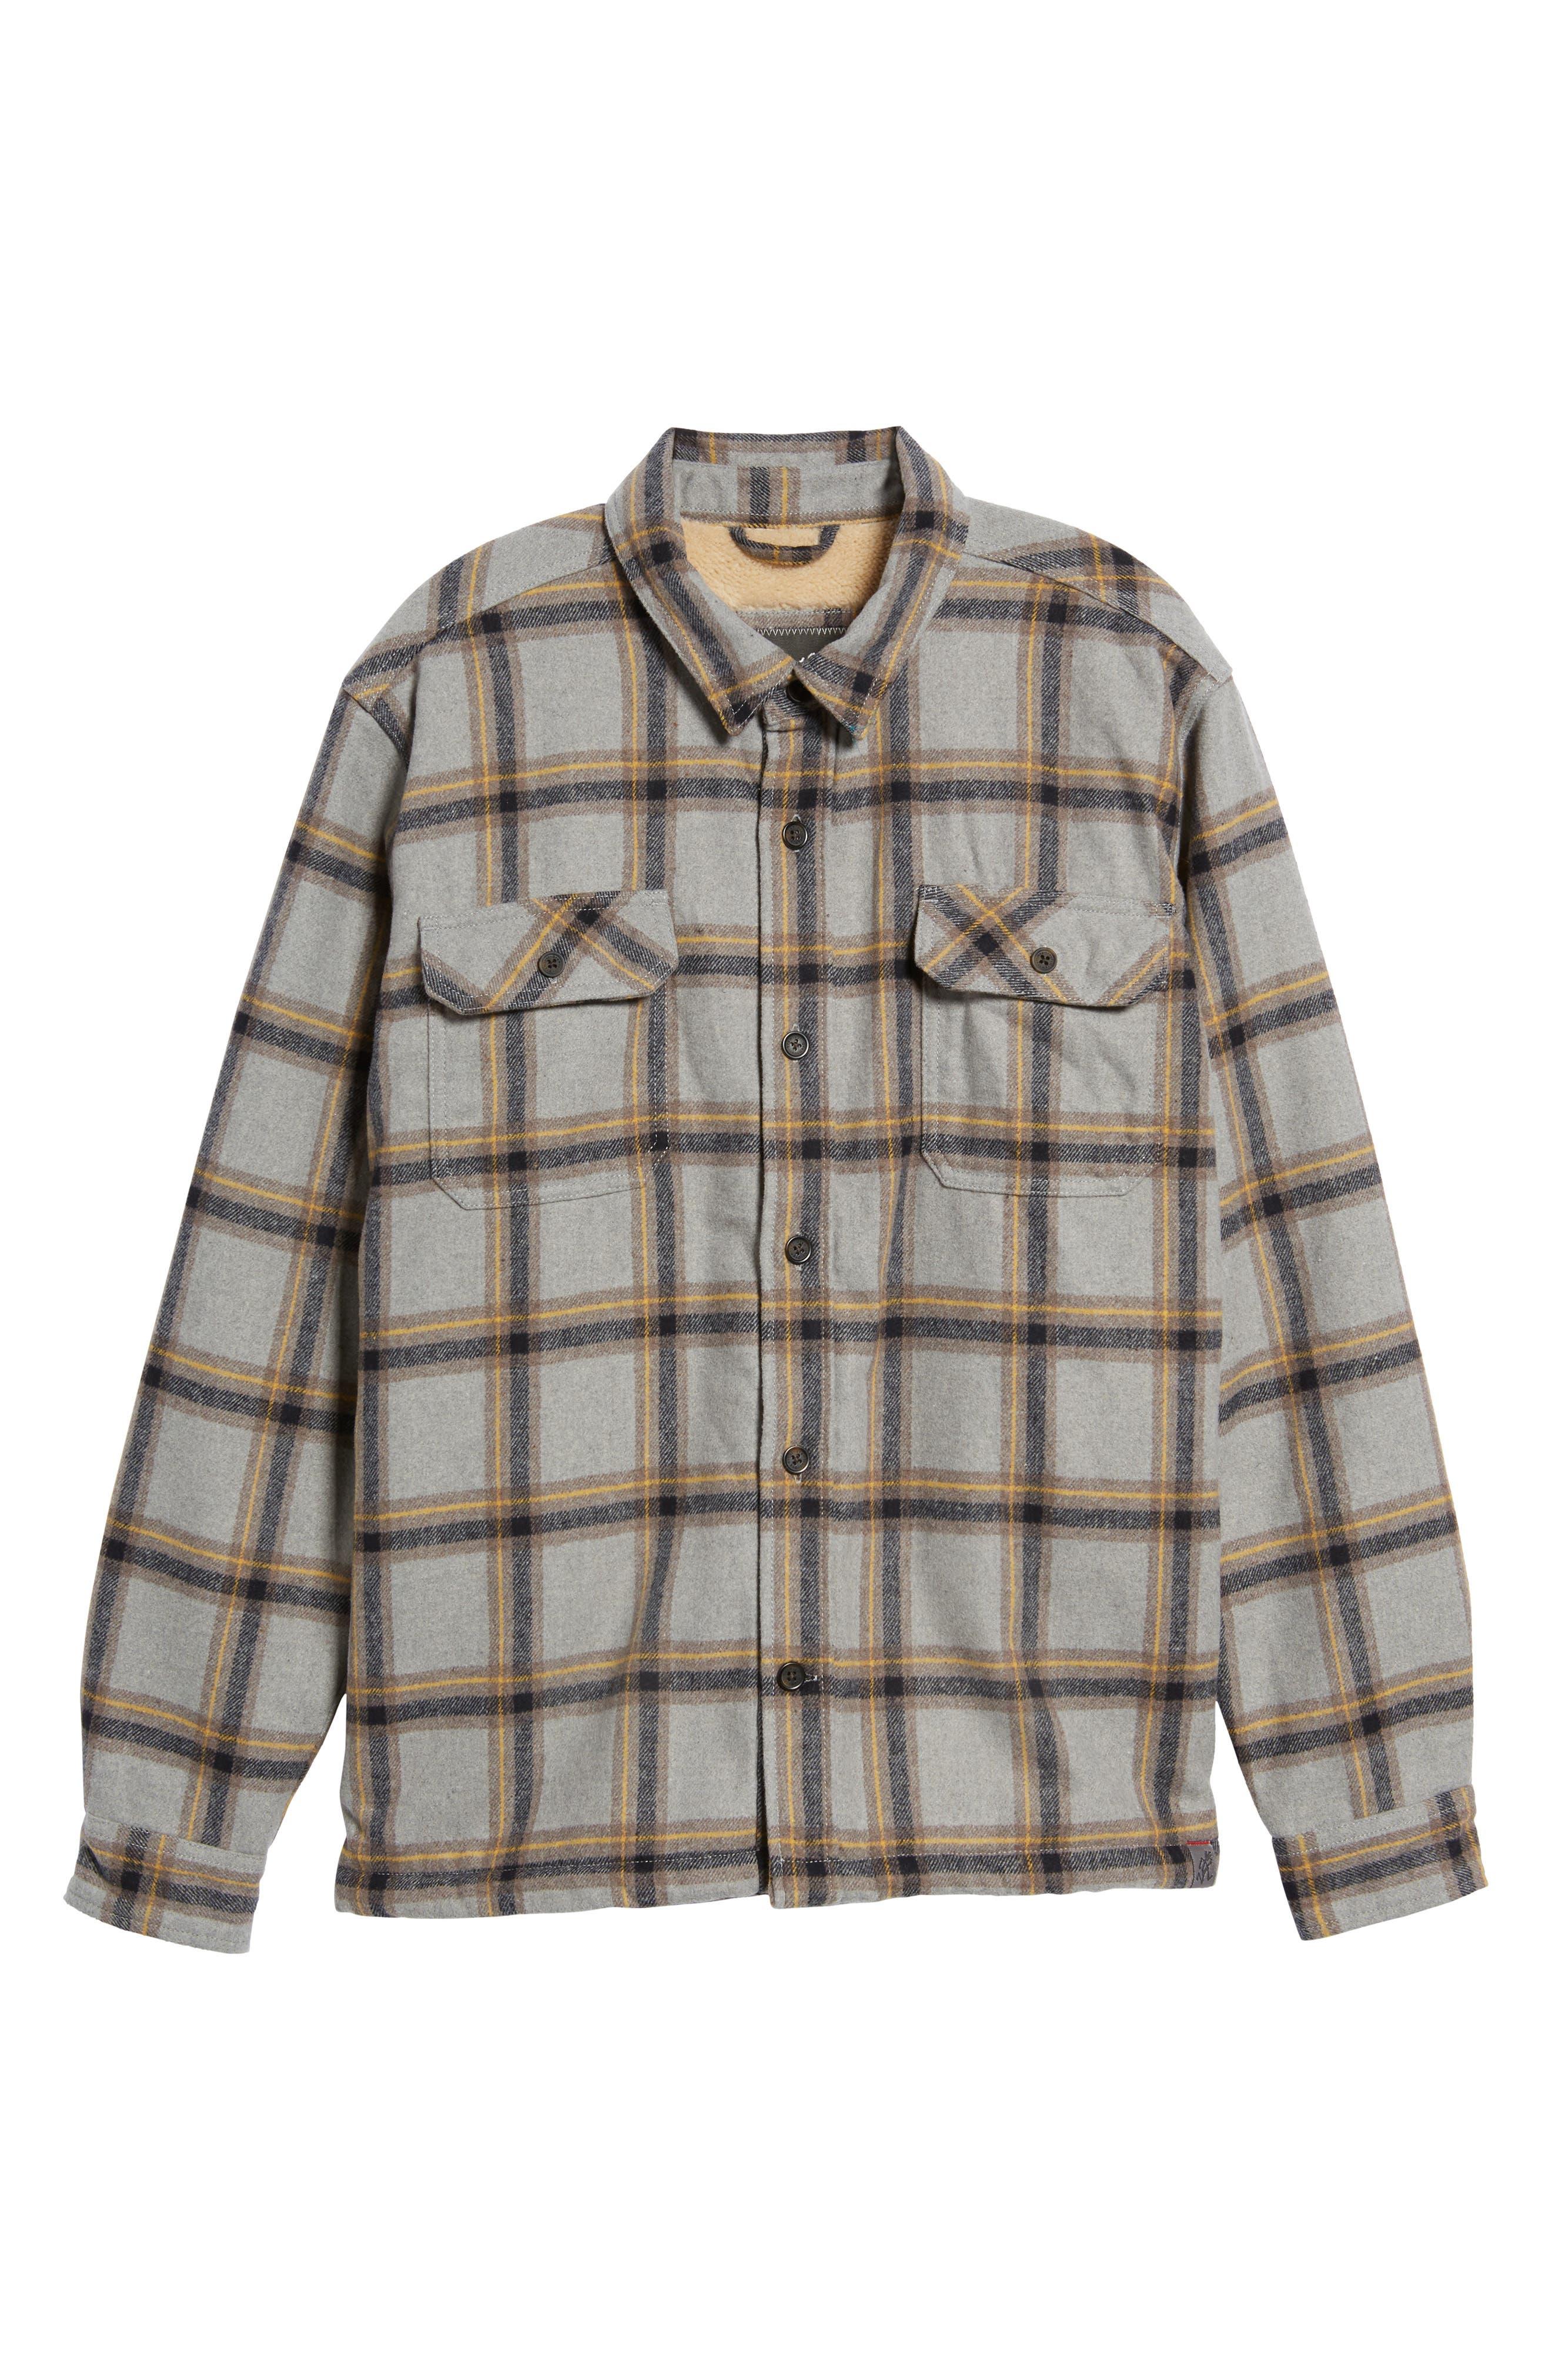 Tough Guy Plush Lined Flannel Shirt Jacket,                             Alternate thumbnail 6, color,                             Light Grey